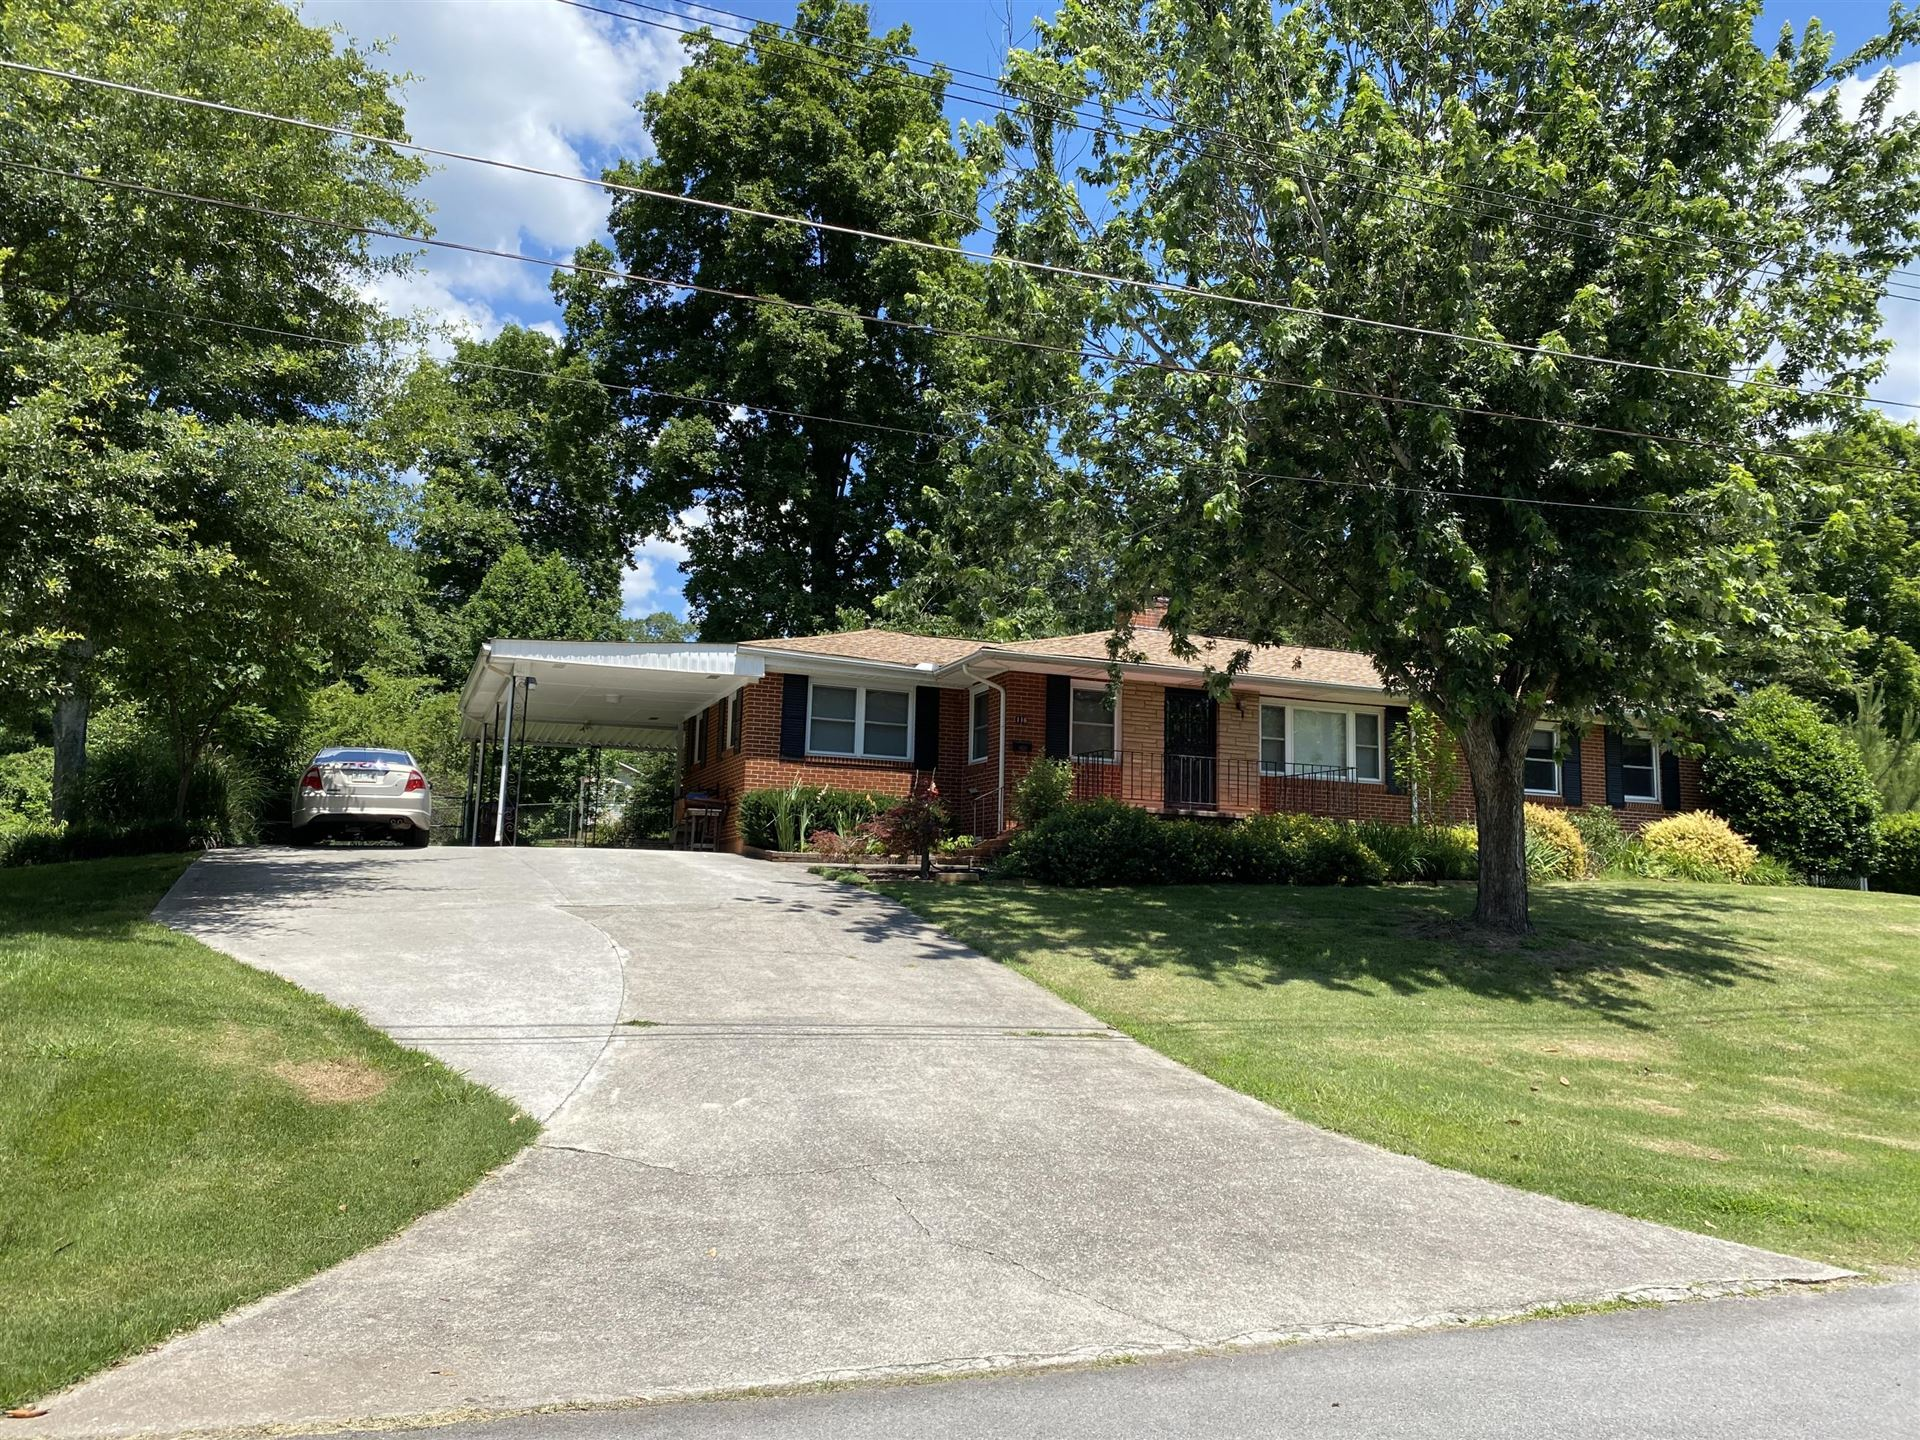 Photo of 116 W Maiden Lane, Oak Ridge, TN 37830 (MLS # 1156905)